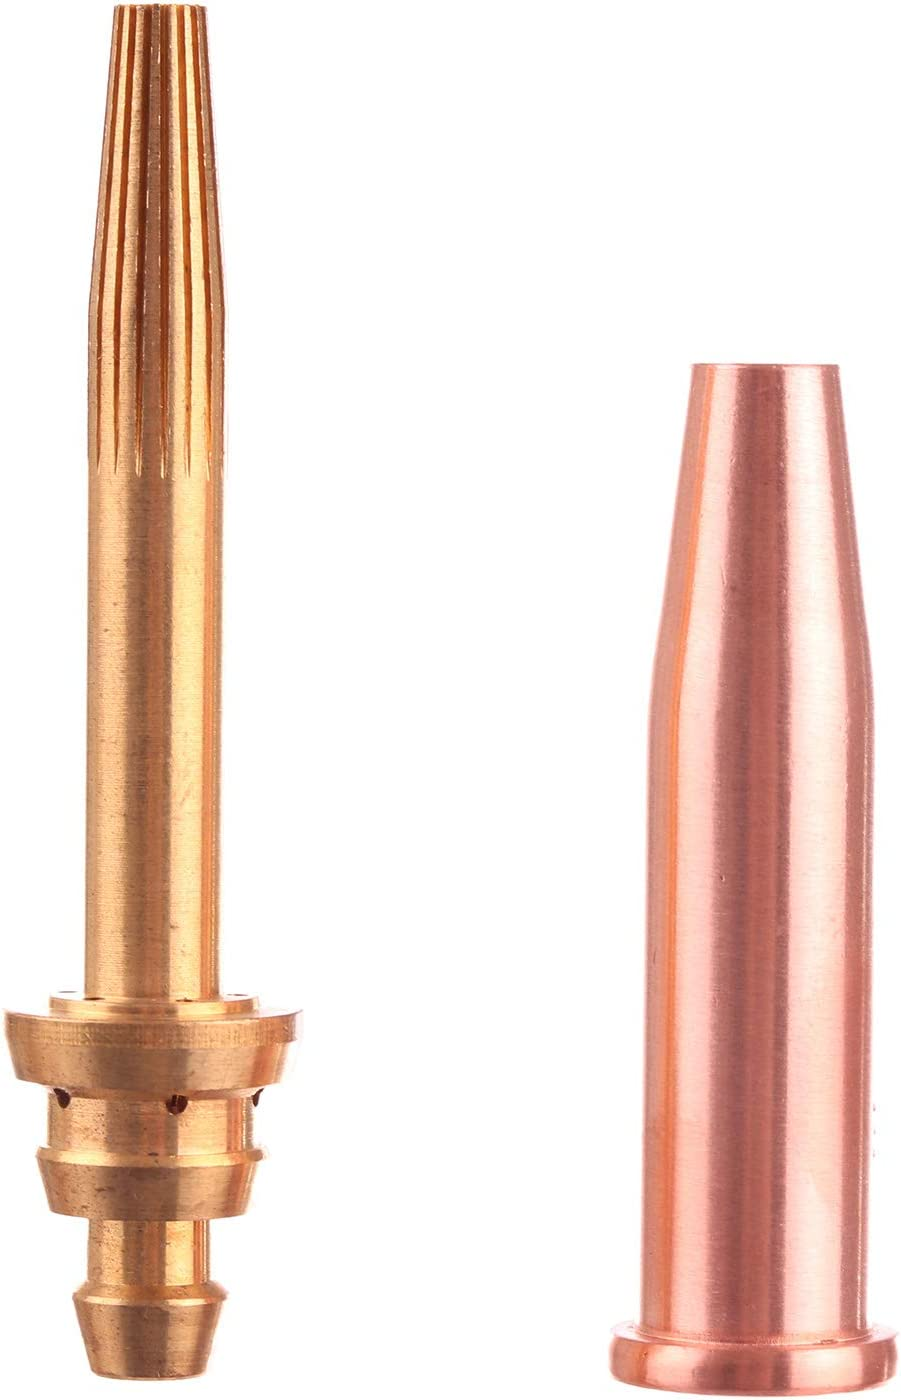 4X Oxy Propane Gas Cutting Nozzle Tip Standard PNM Propane 3-10mm 10-25mm 25-50mm 50-100mm Cutting Torch